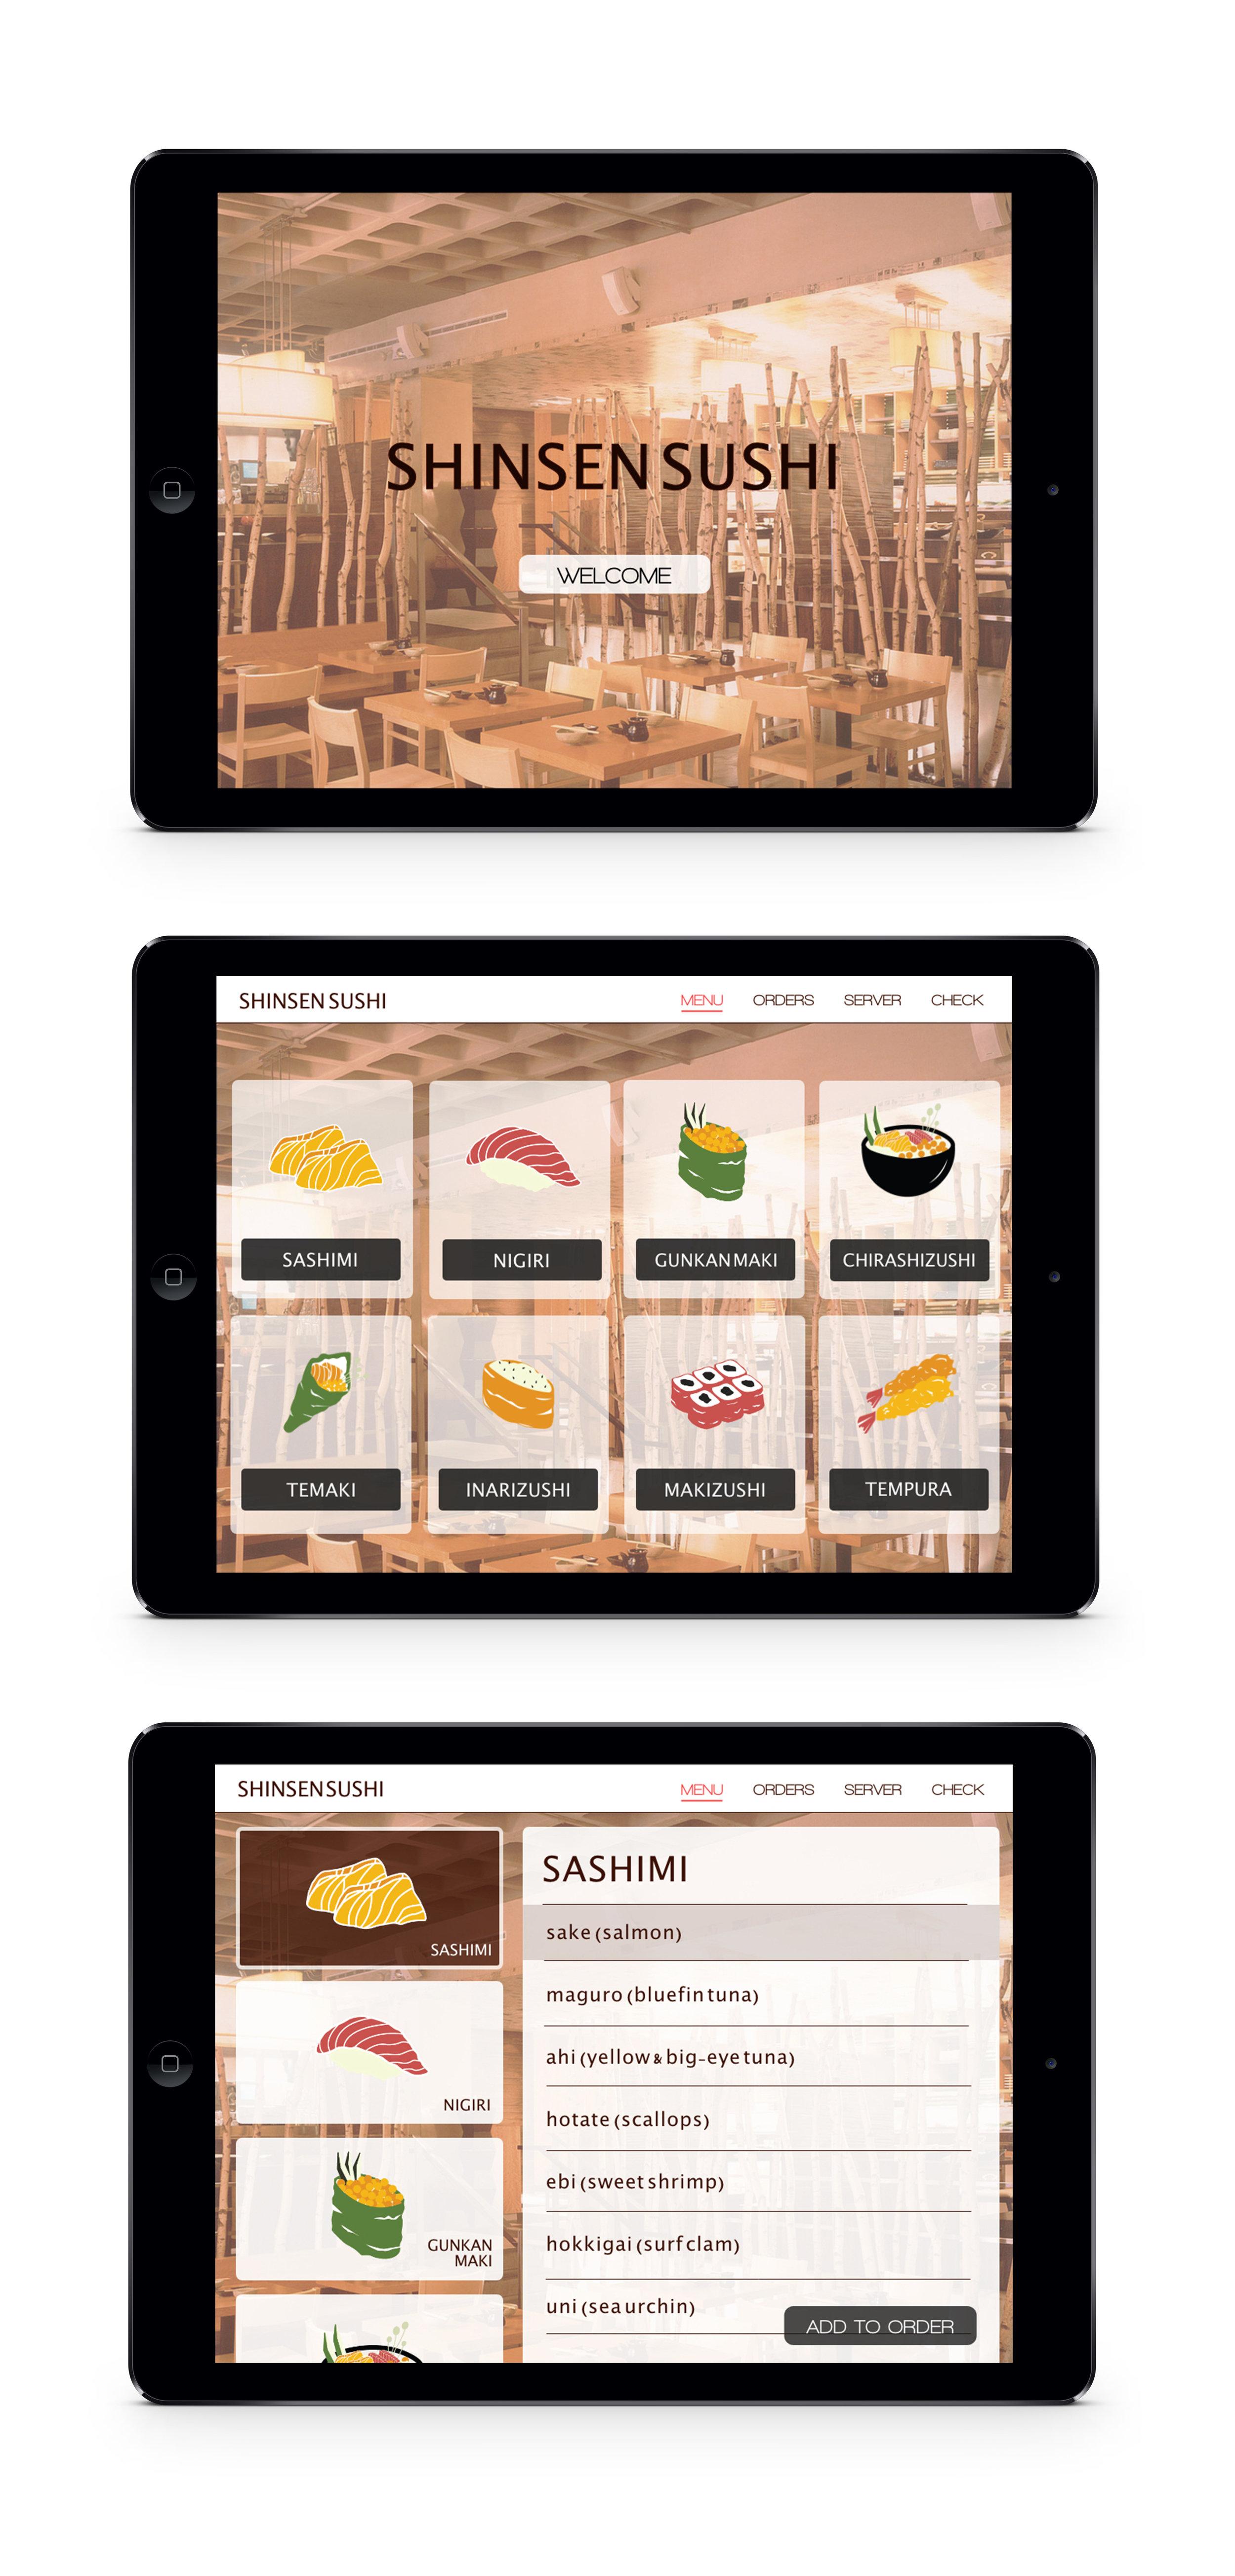 sushiiconsmockup.jpg